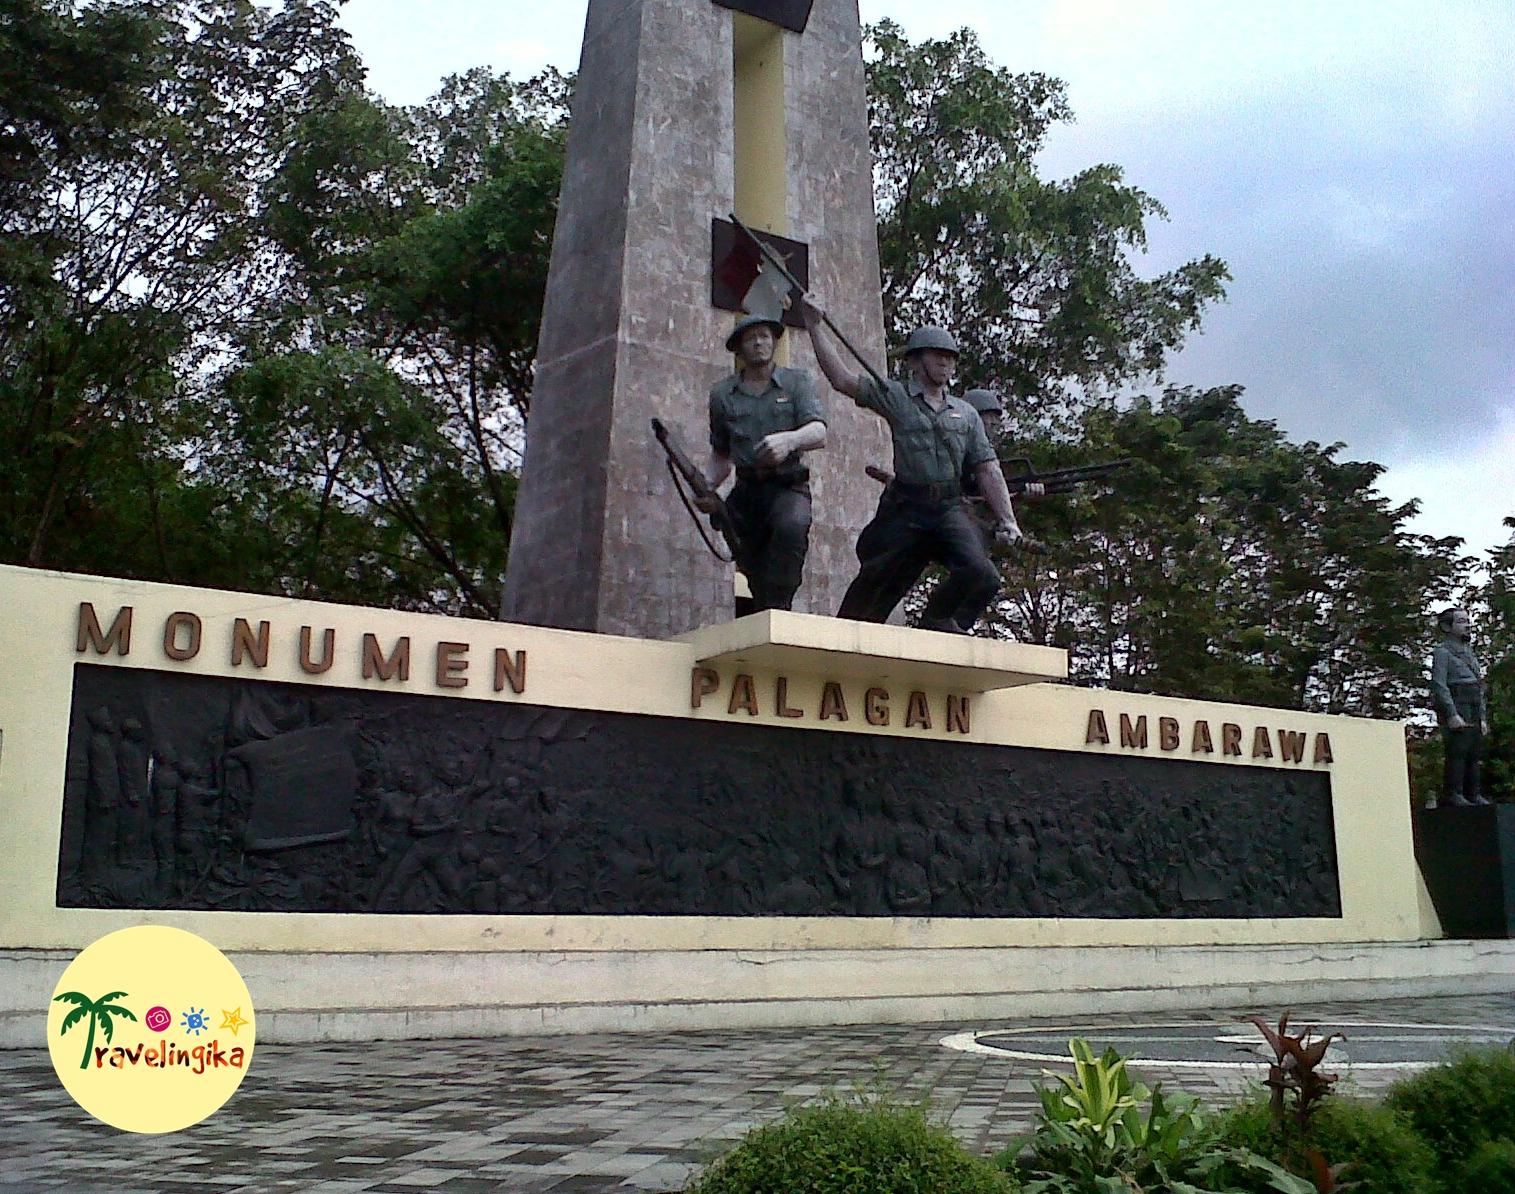 Monumen Palagan Ambarawa Flashback Perang Travelingika Terang Jarang Melakukan Family